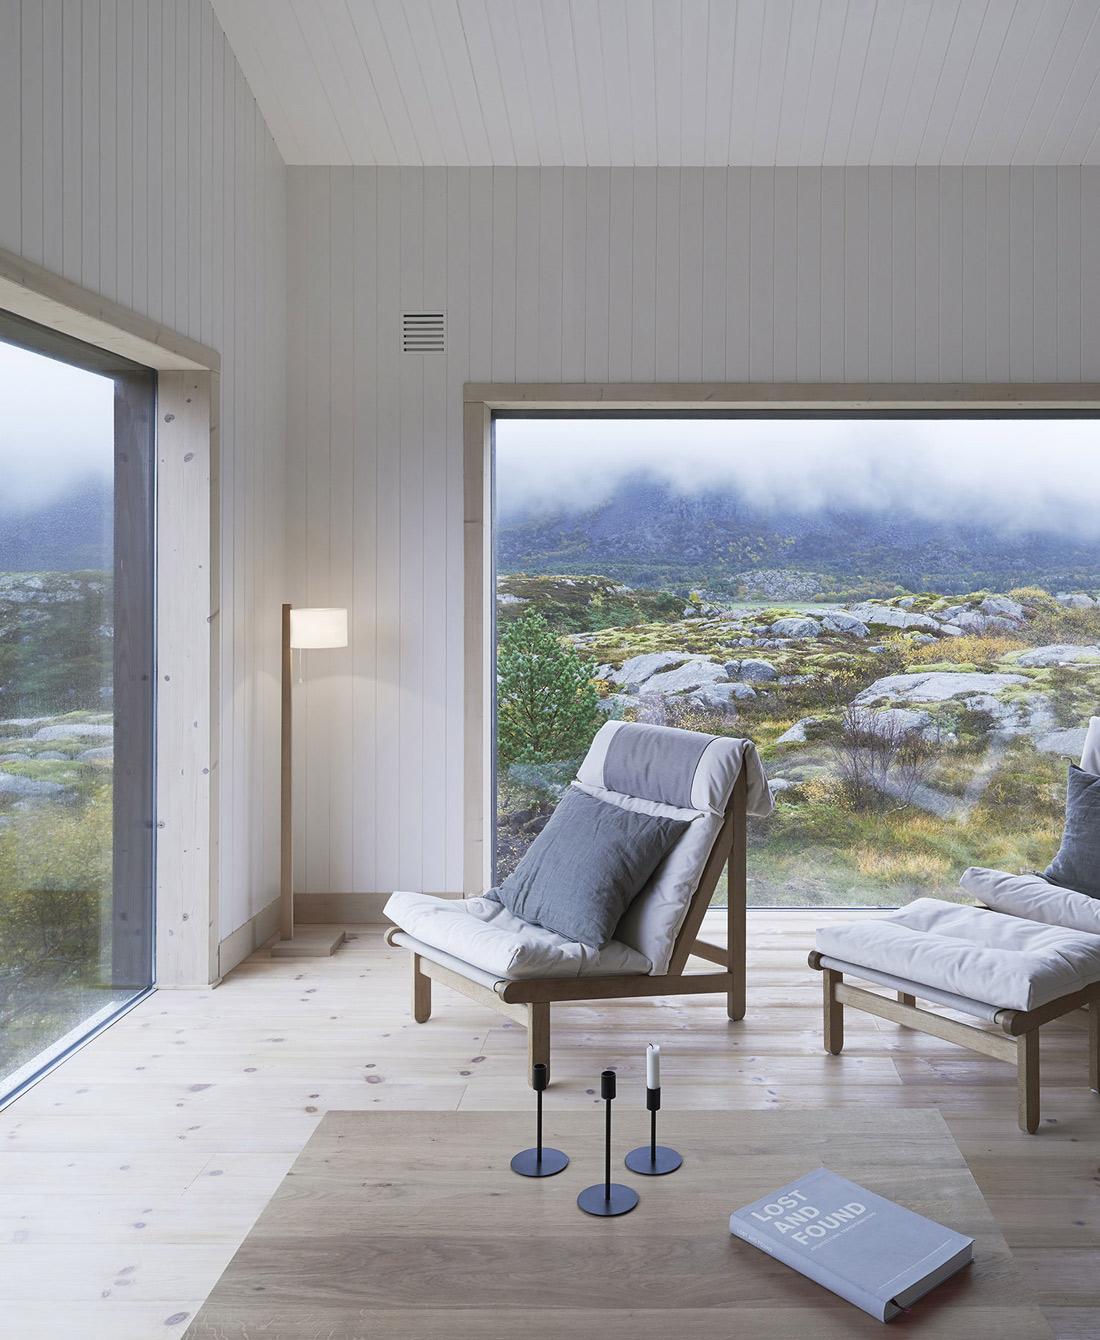 Coffee Table, Chairs, Lamp, Large Windows, Vega Cottage in Vega, Norway